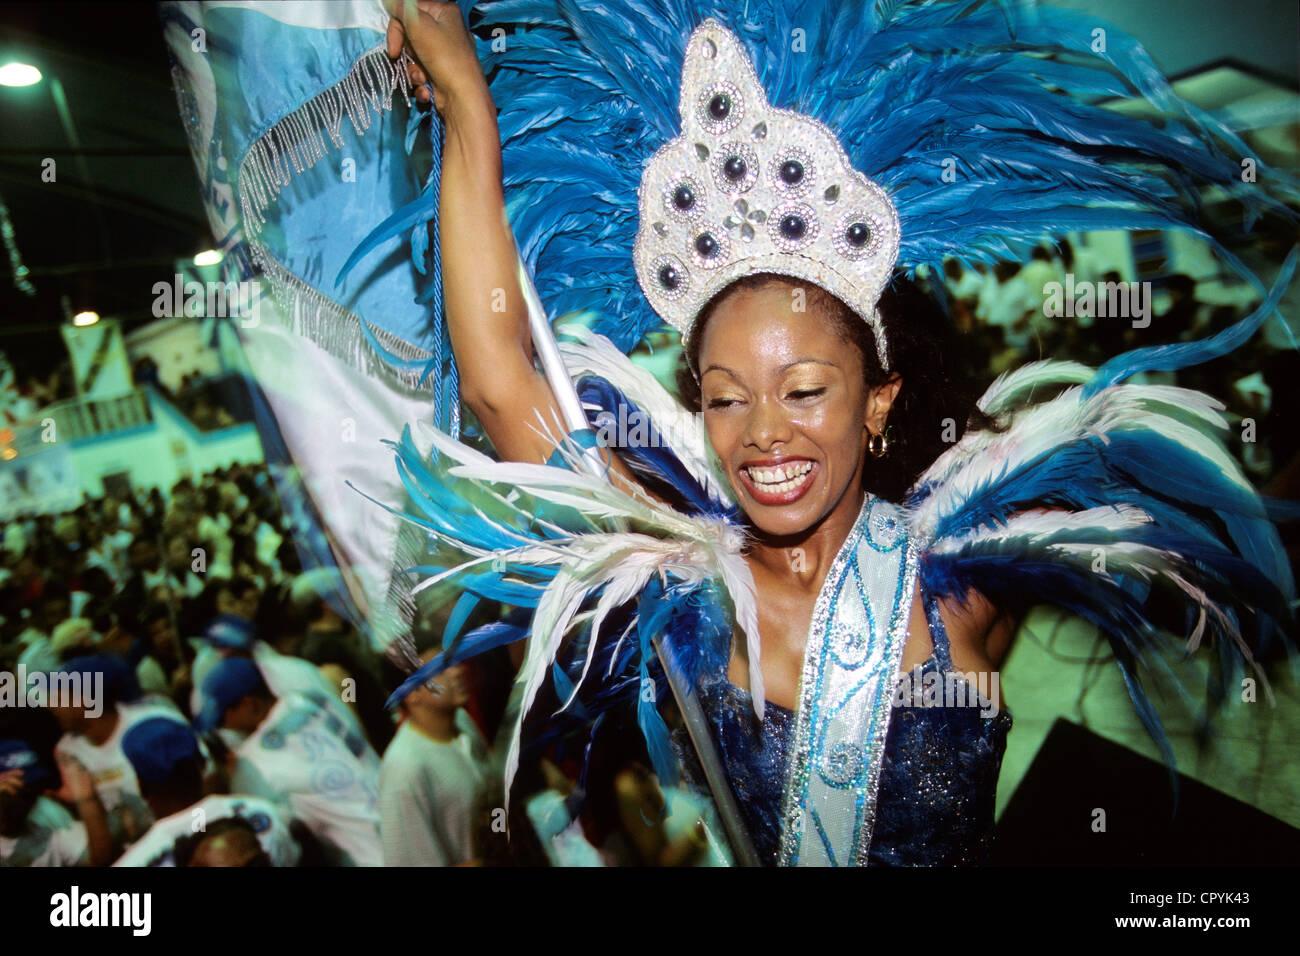 Brazil Rio de Janeiro toutes les écoles de samba font discothèque le samedi soir comme celle de La Porteña - Stock Image